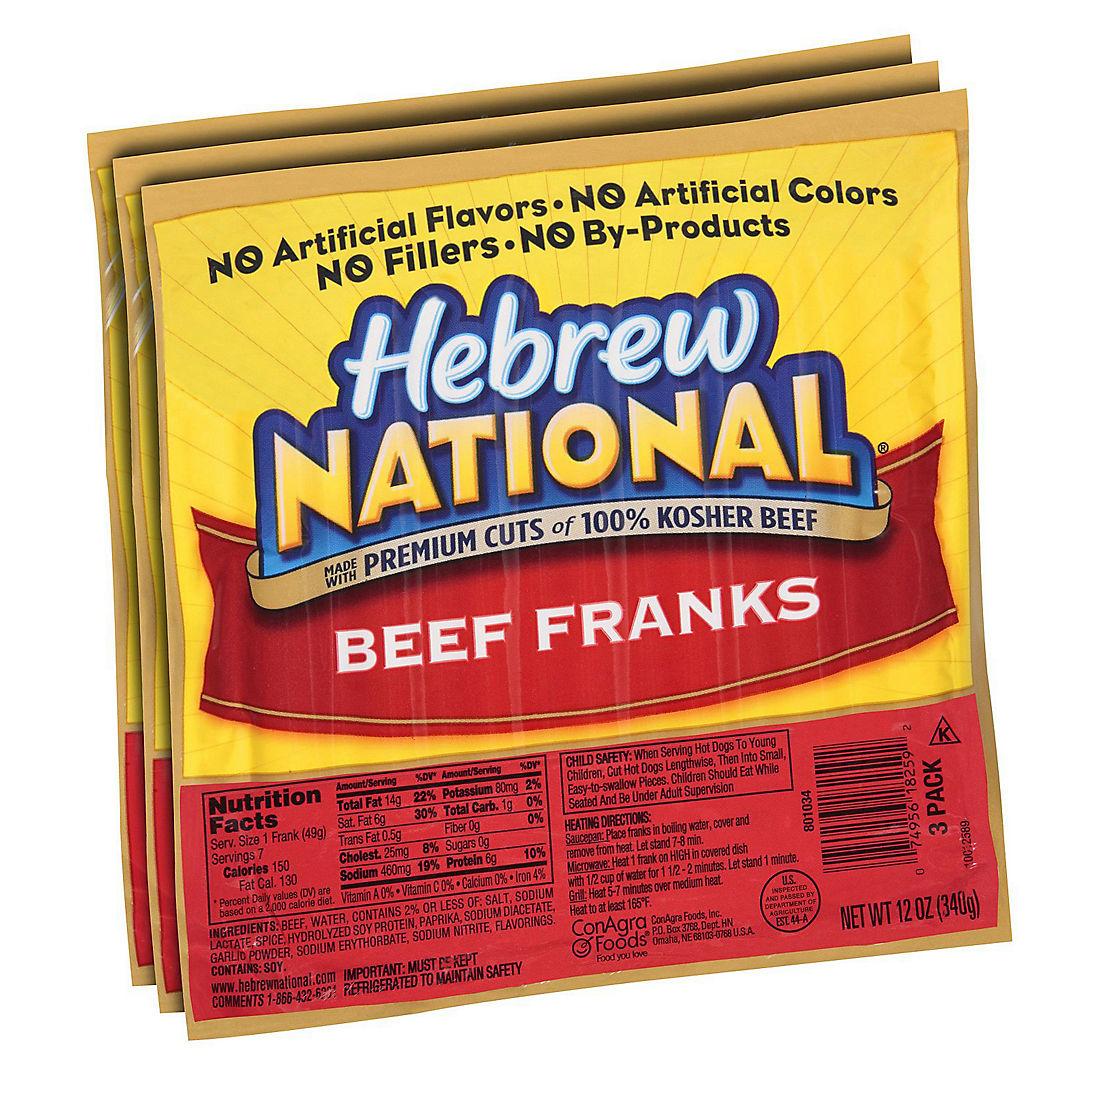 Hebrew national beef franks keychain